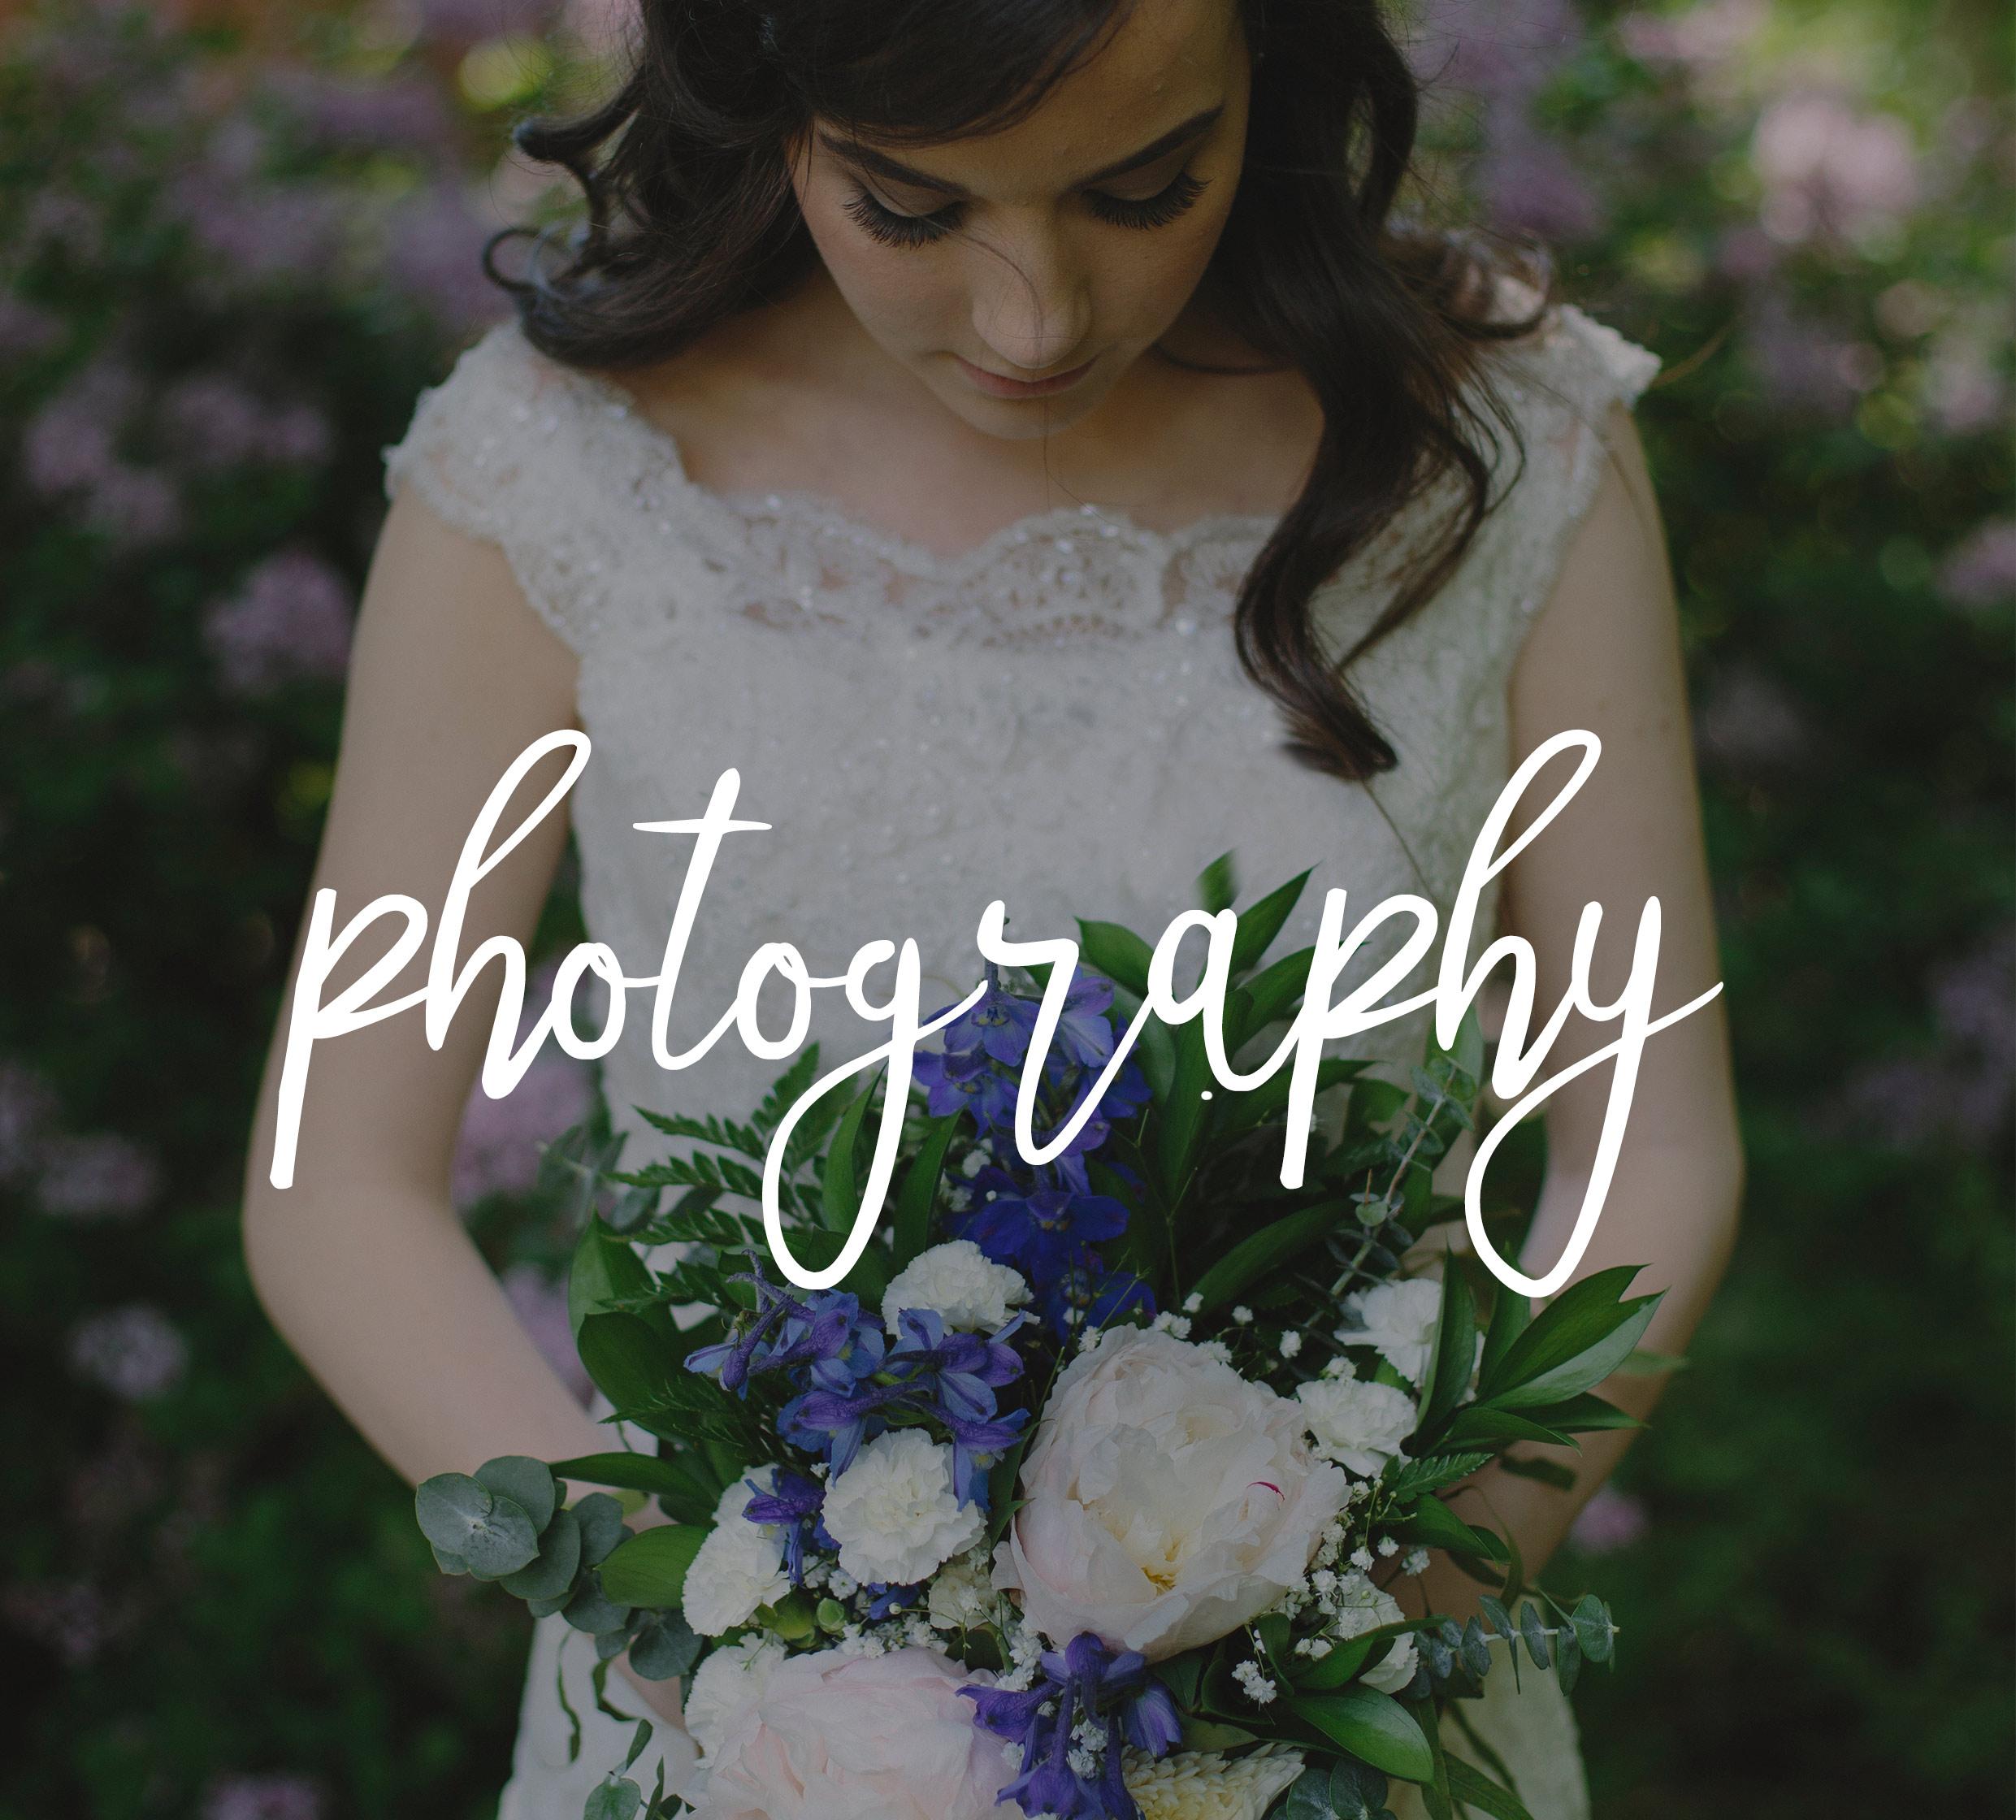 F-photo.jpg